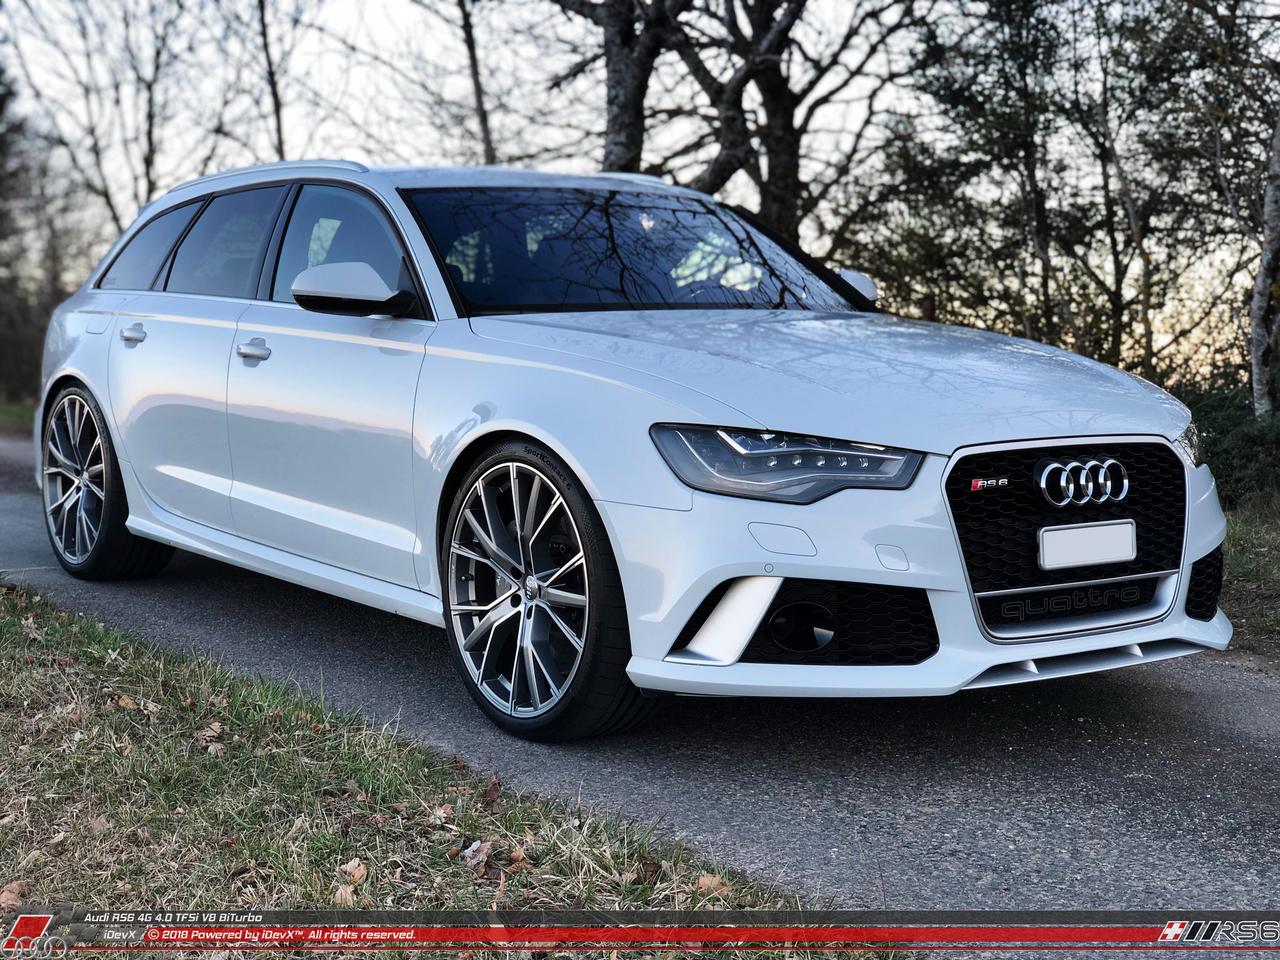 22_02.2019_Audi-RS6_iDevX_010.png